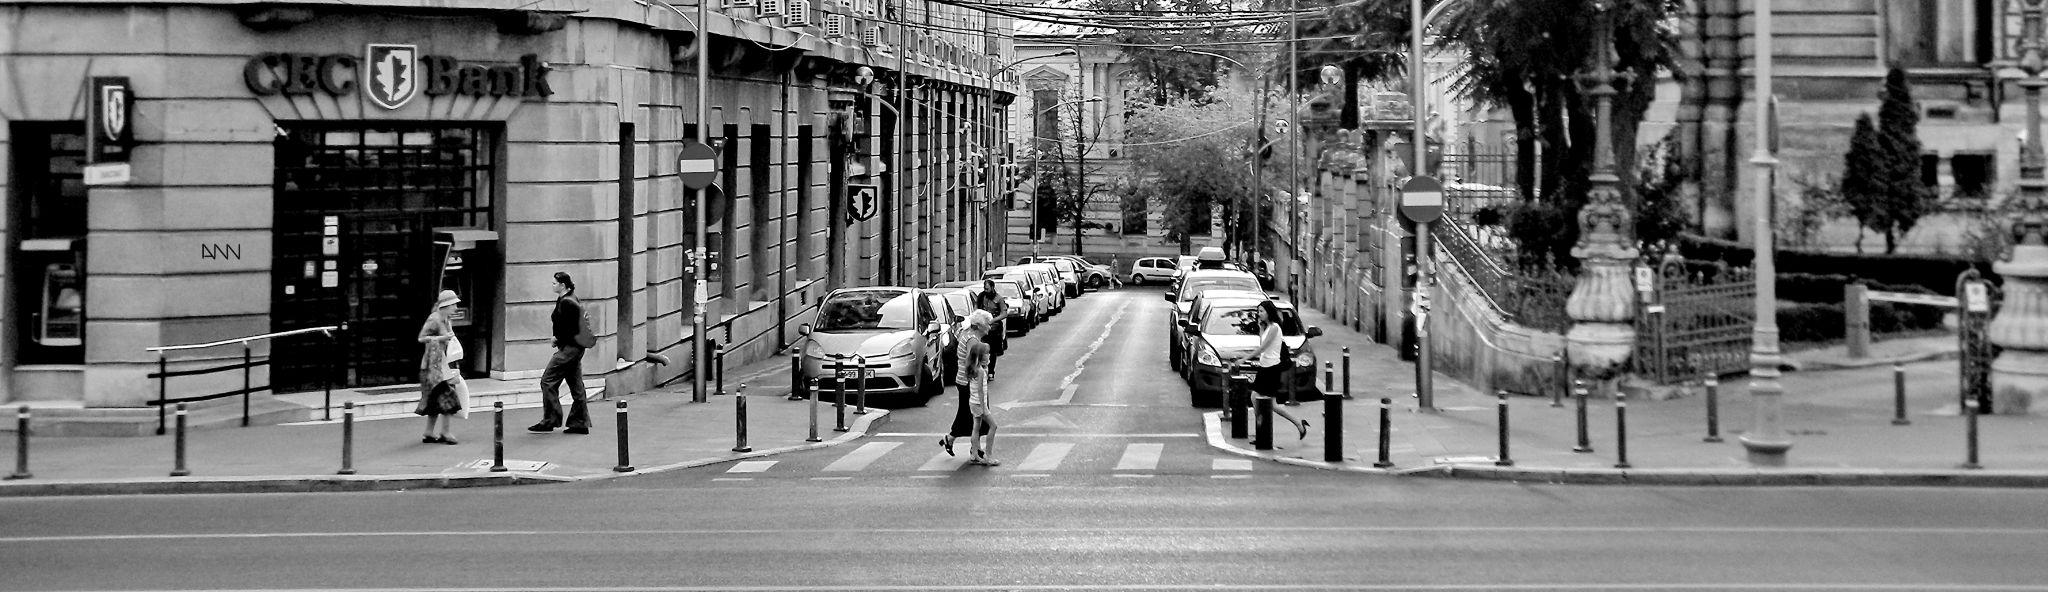 Street by Anton Nistor Nicolae